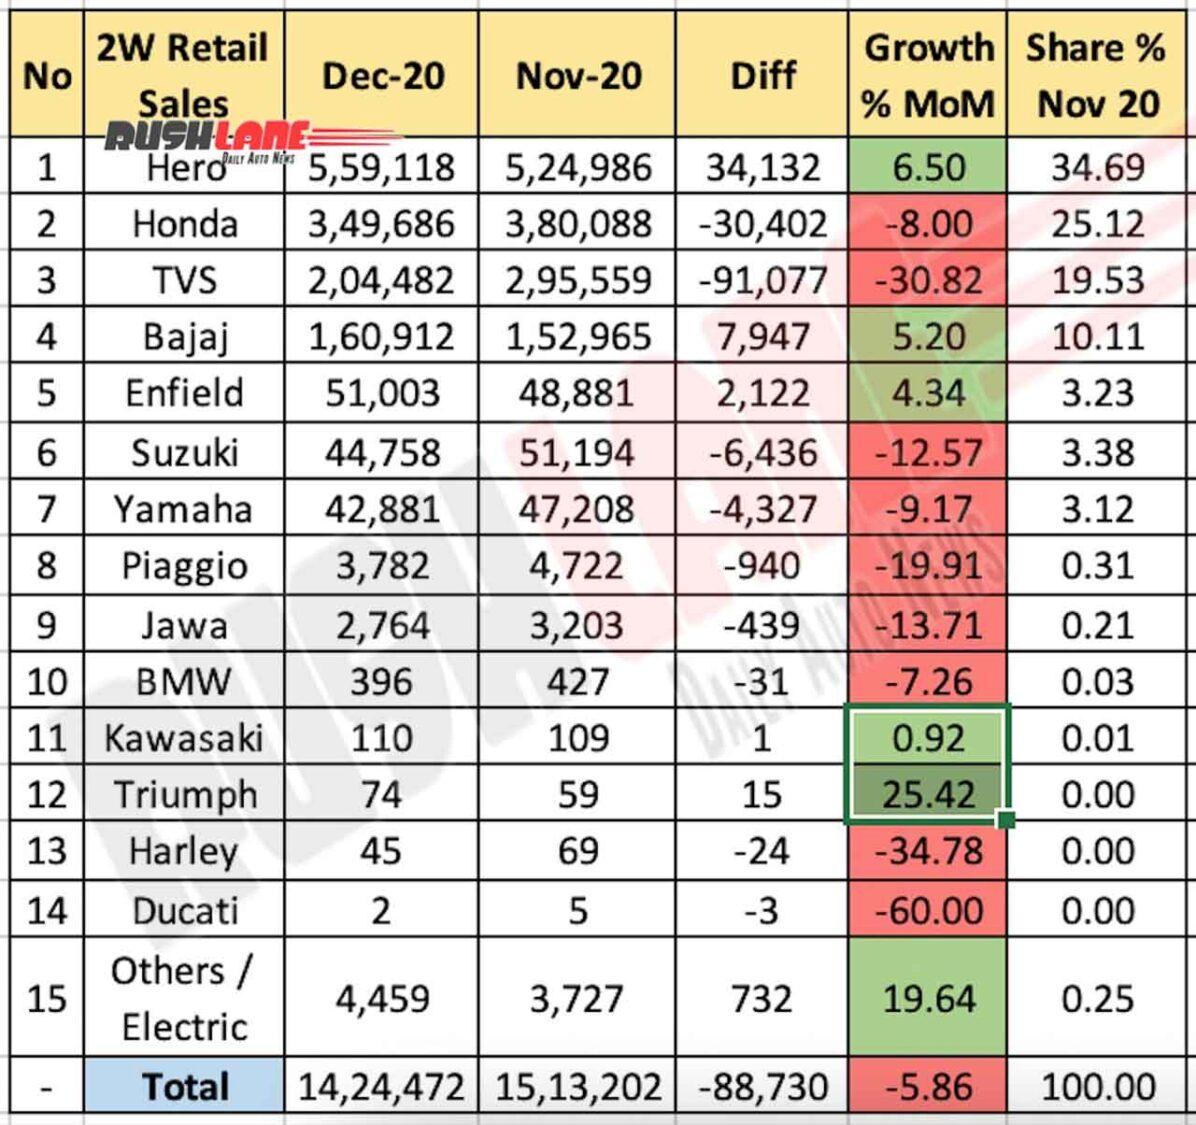 Two Wheeler Retail Sales Dec 2020